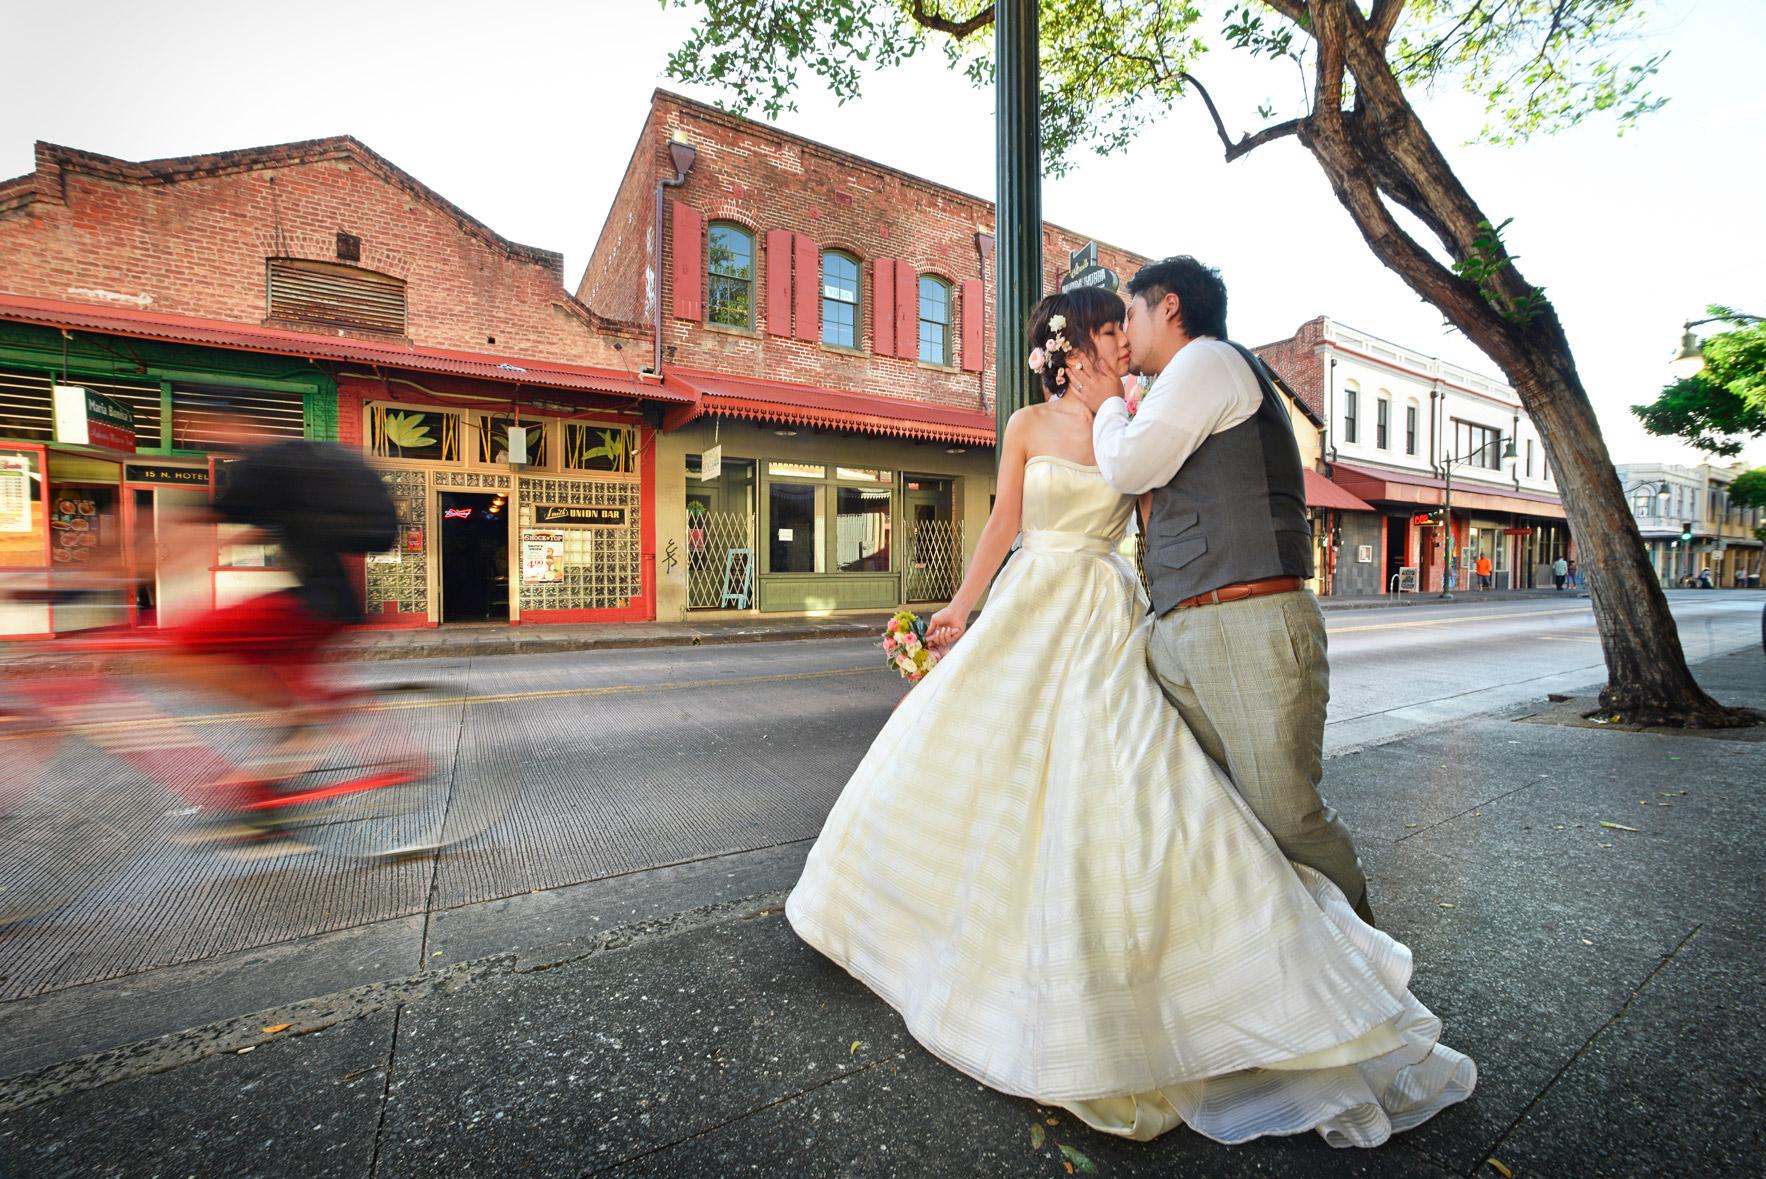 waikiki-beach-wedding-and-downtown-honolulu-hawaii-theater-stephen-ludwig-photography133.jpg